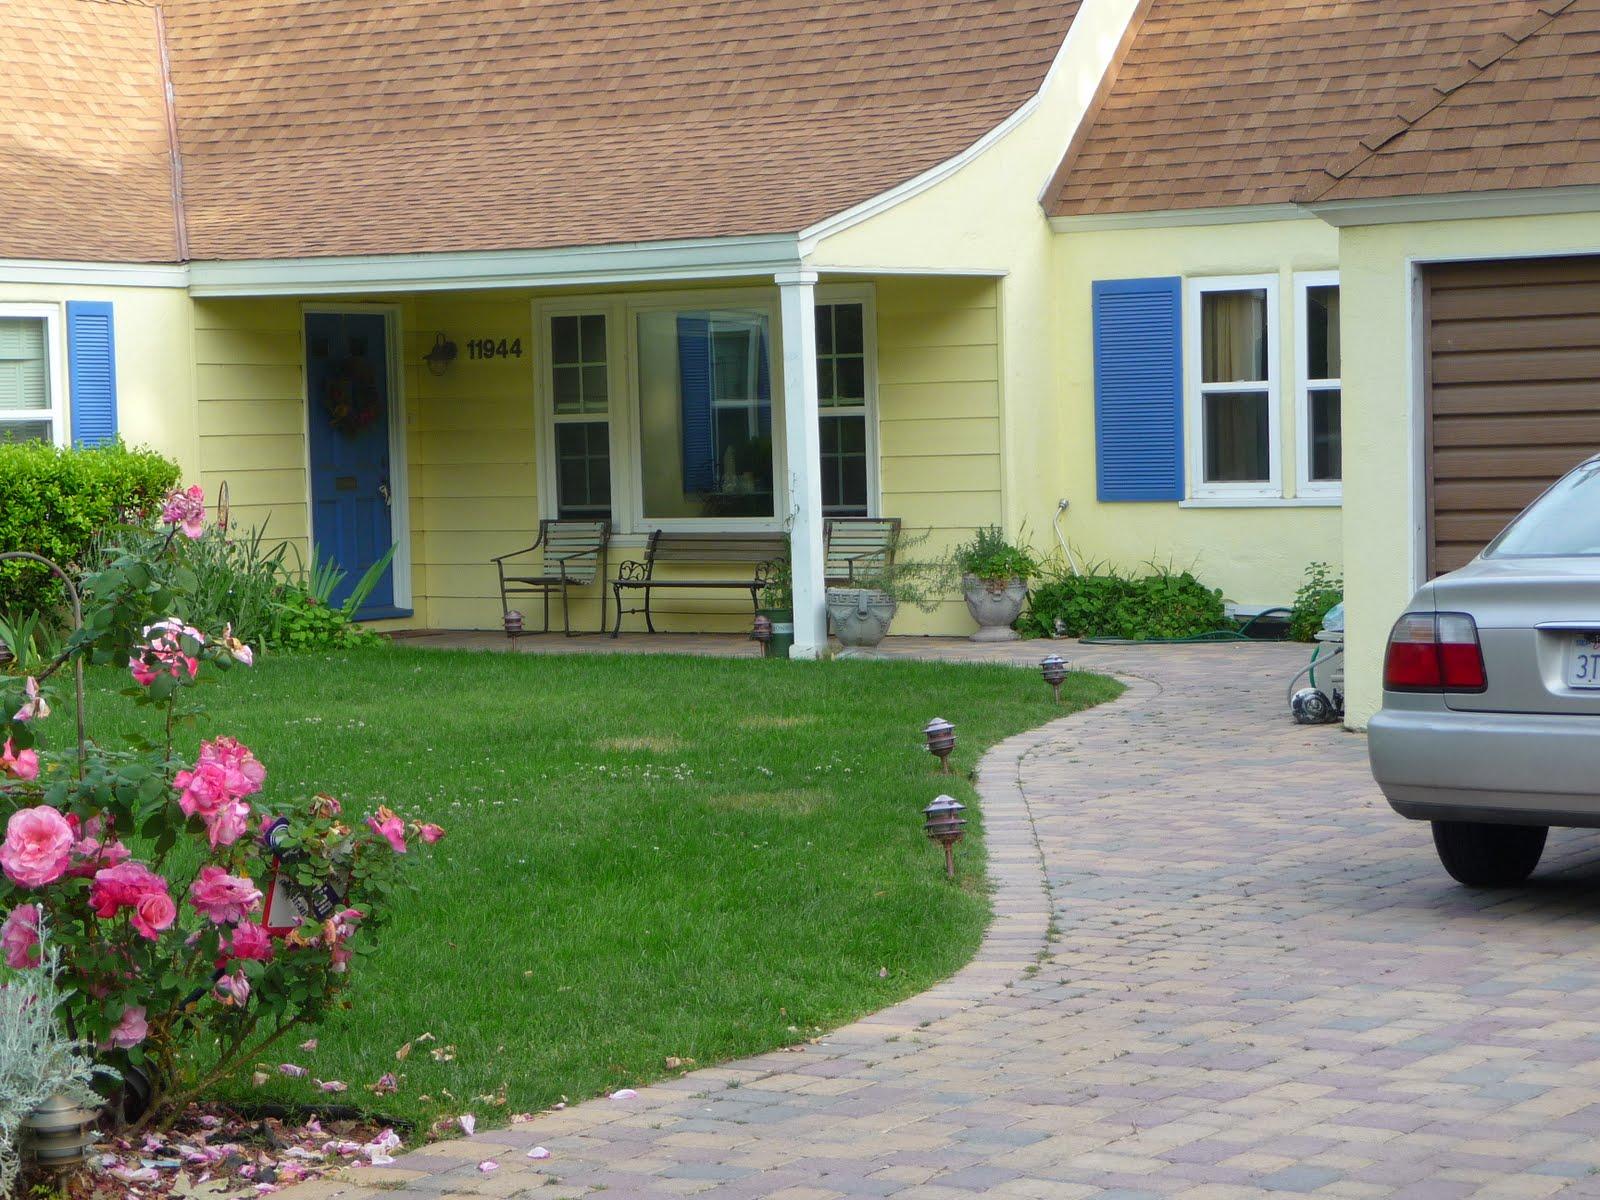 Best Shutter Colors For Yellow House | Credainatcon.com